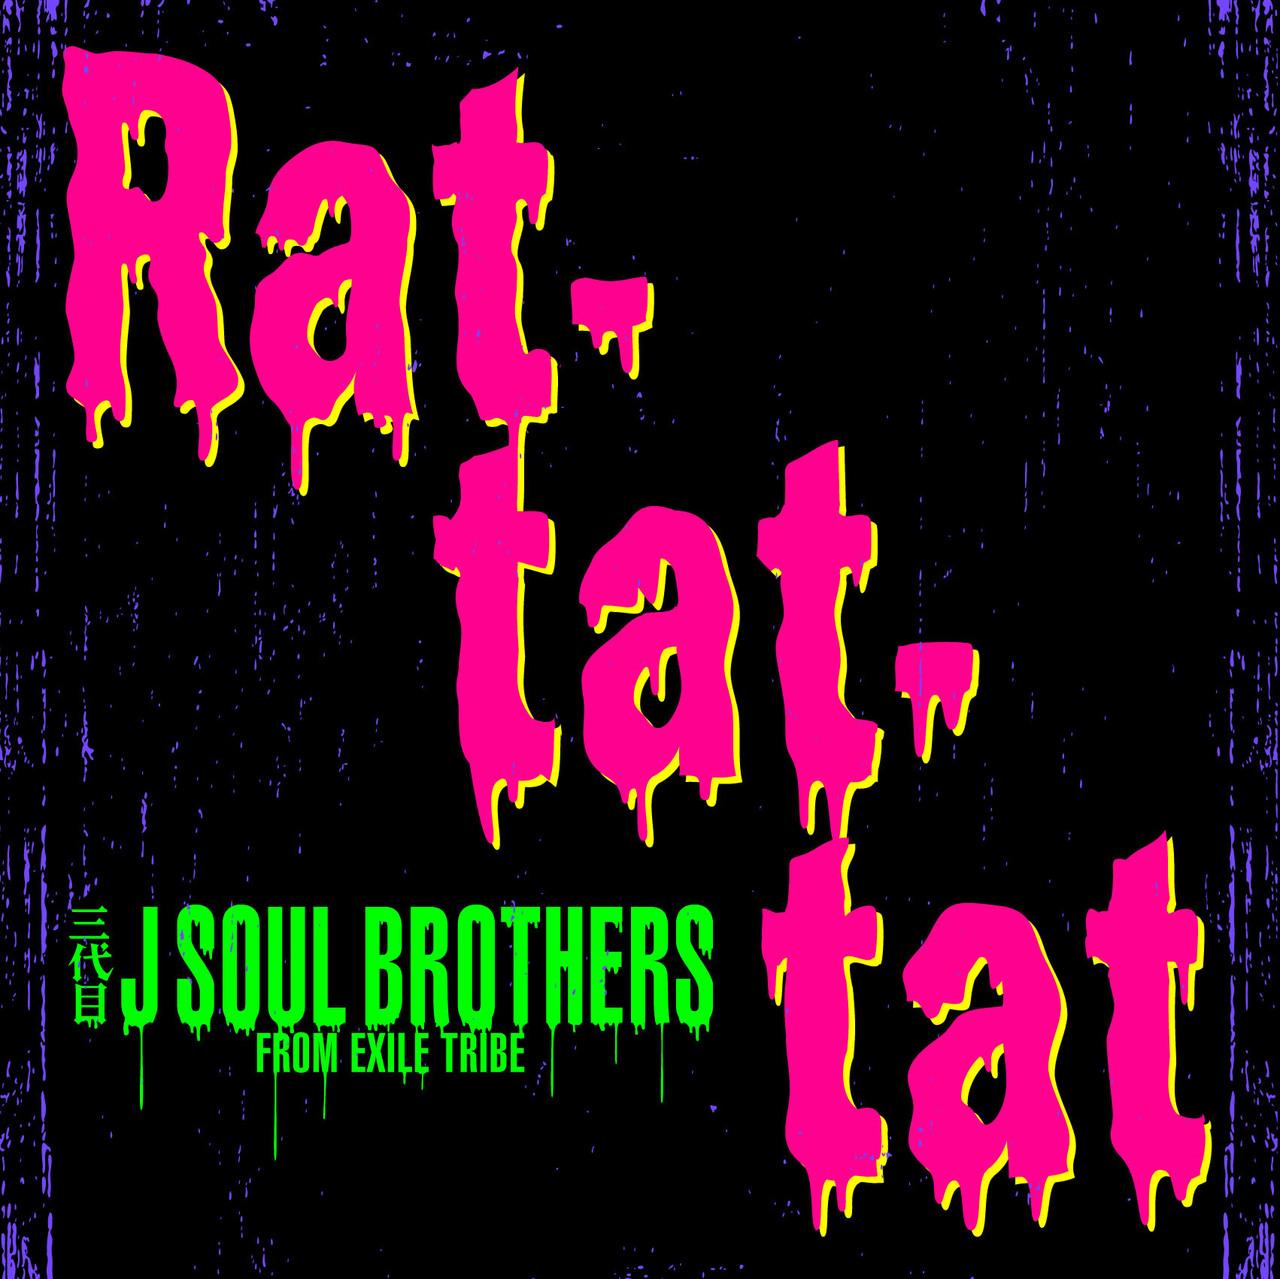 三代目 rat tat tat